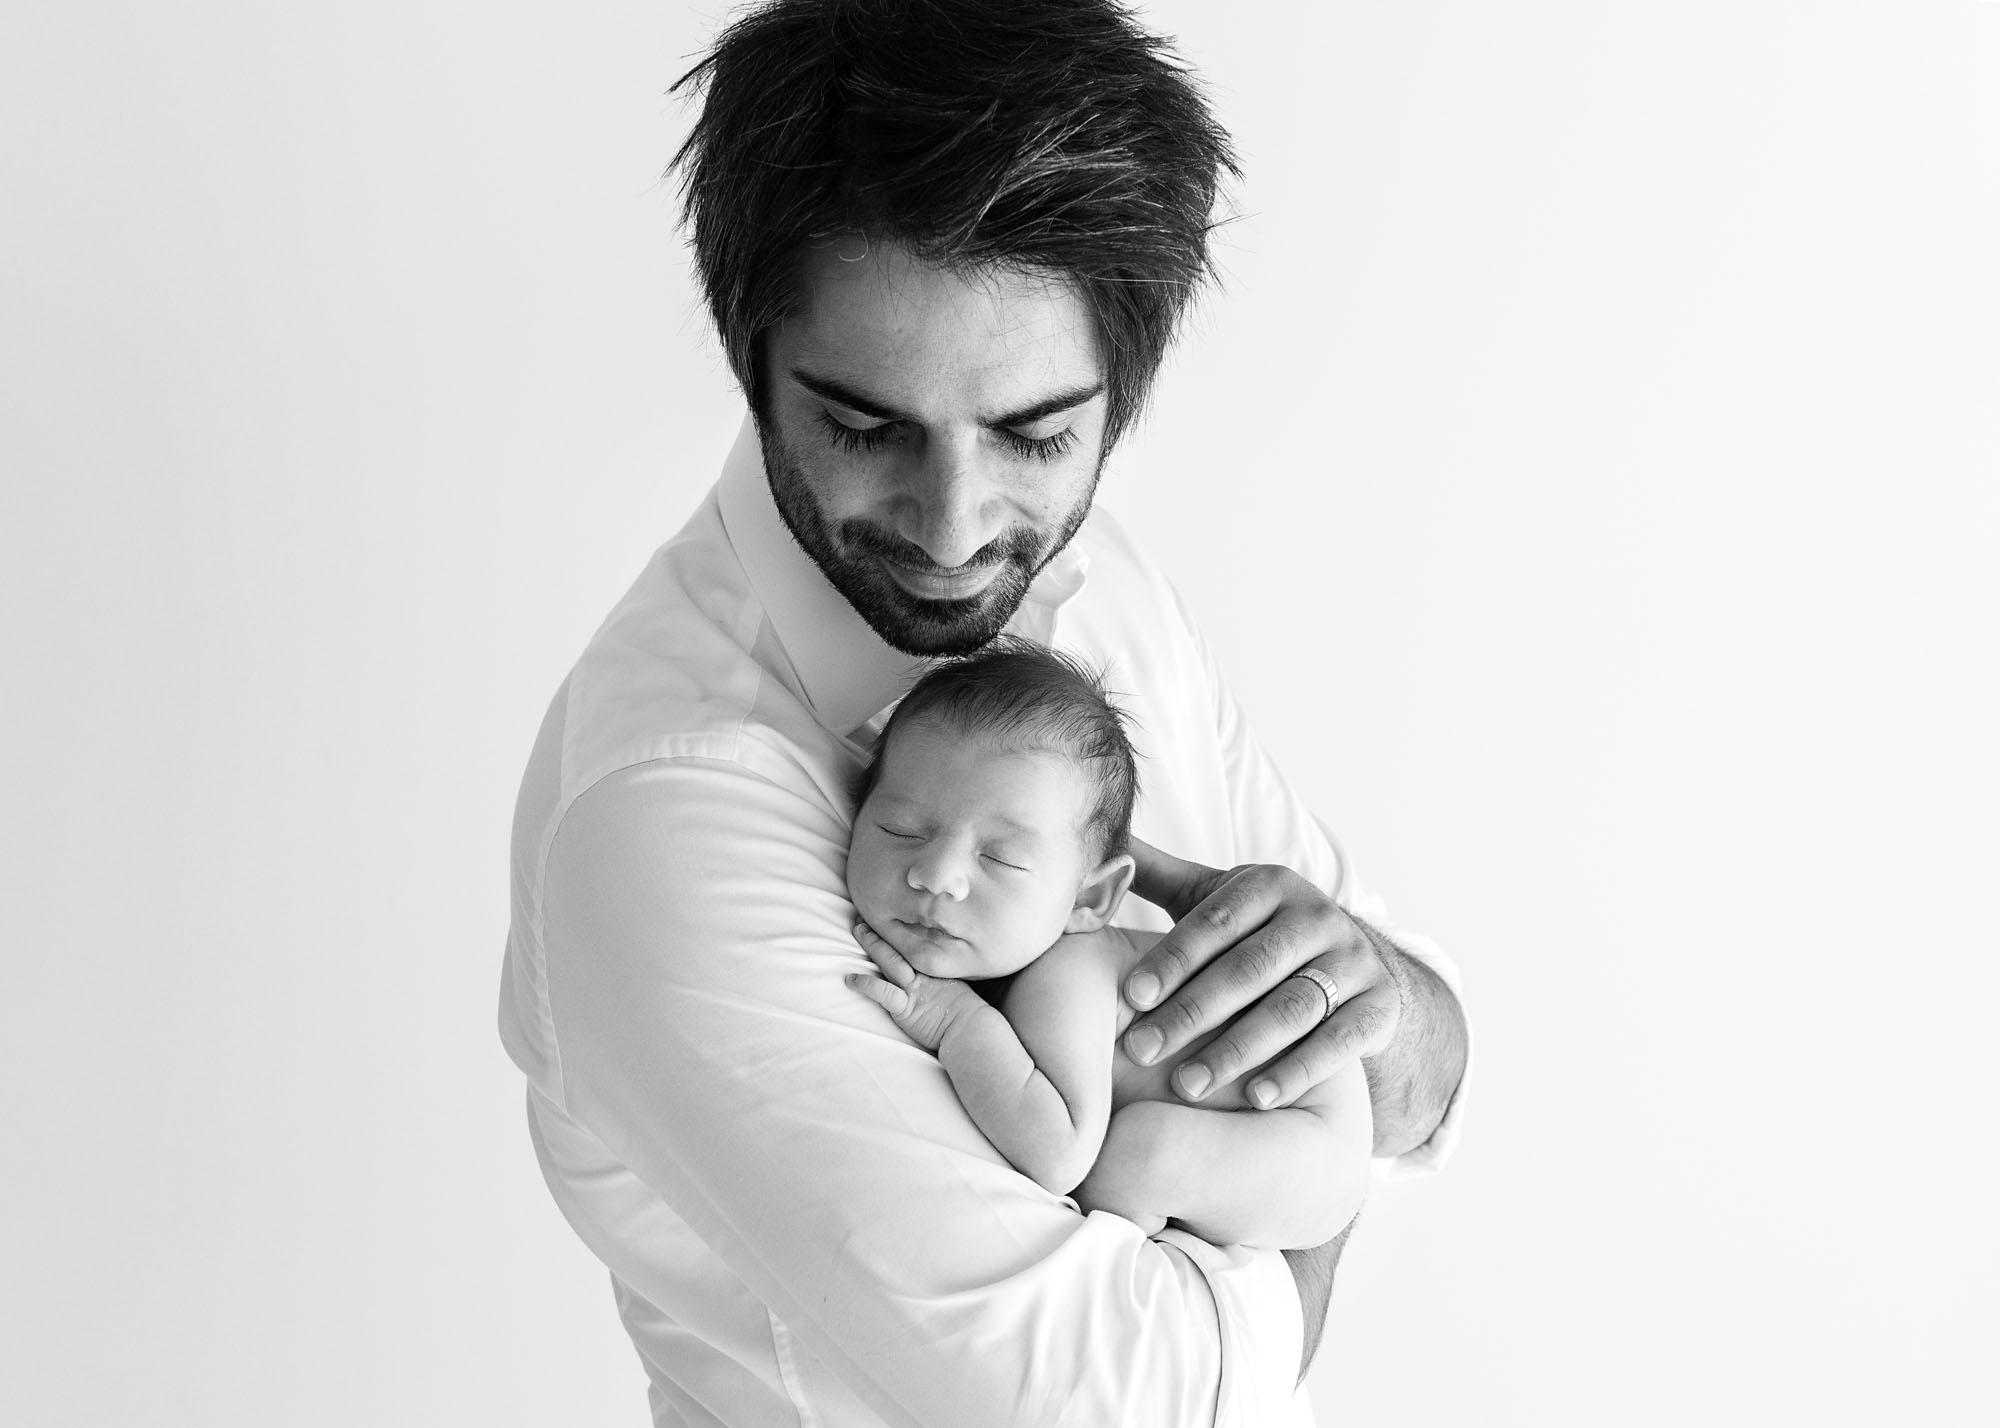 newborn-photography-tory-d-melbourne08.jpg